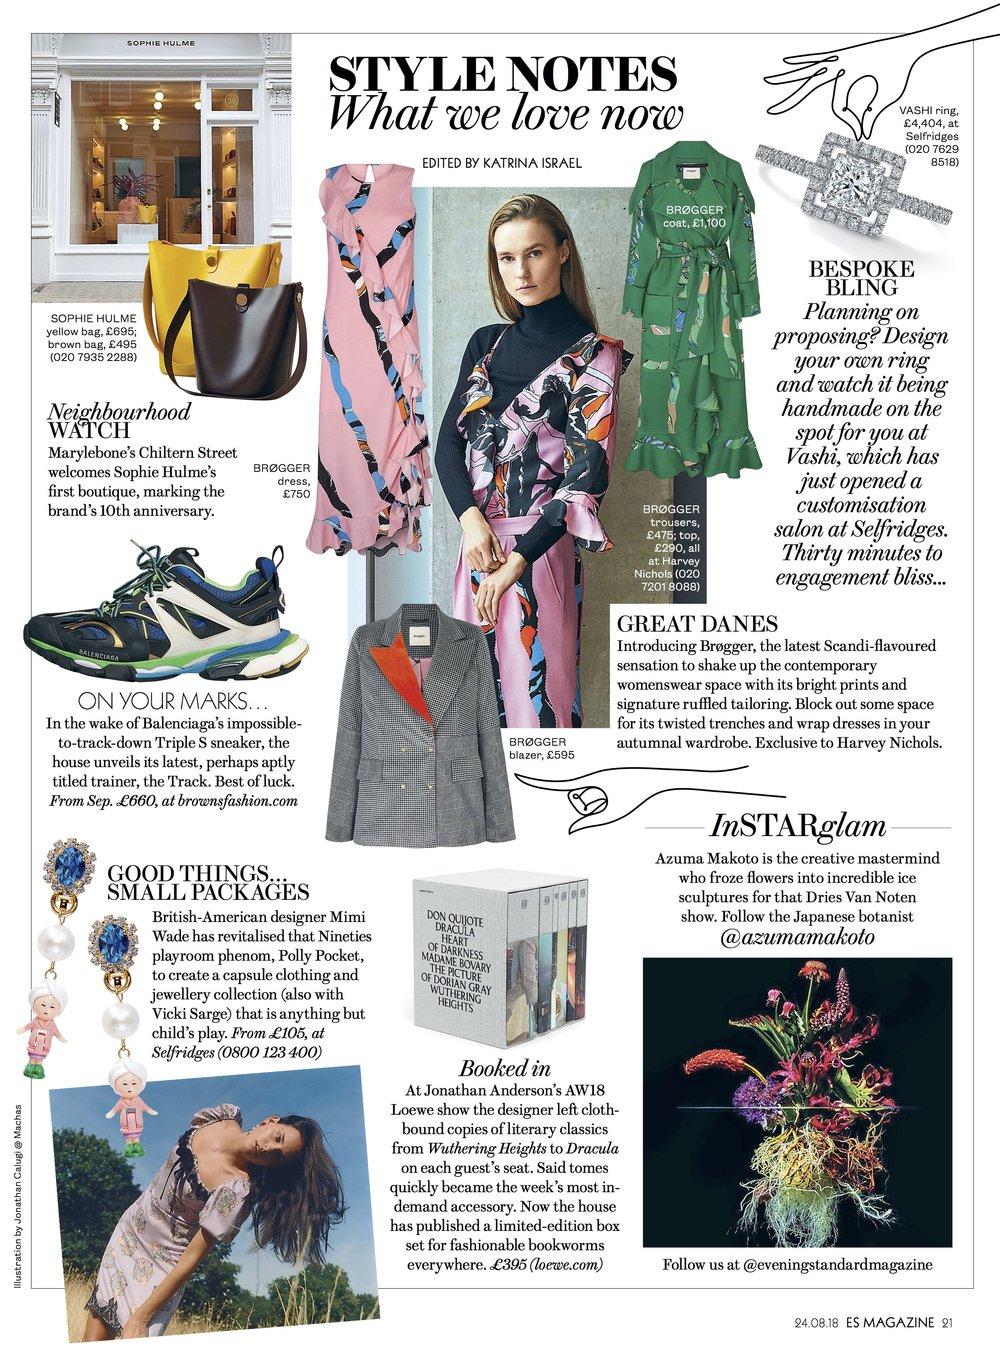 Evening Standard magazine - 23rd August by Katrina Israel